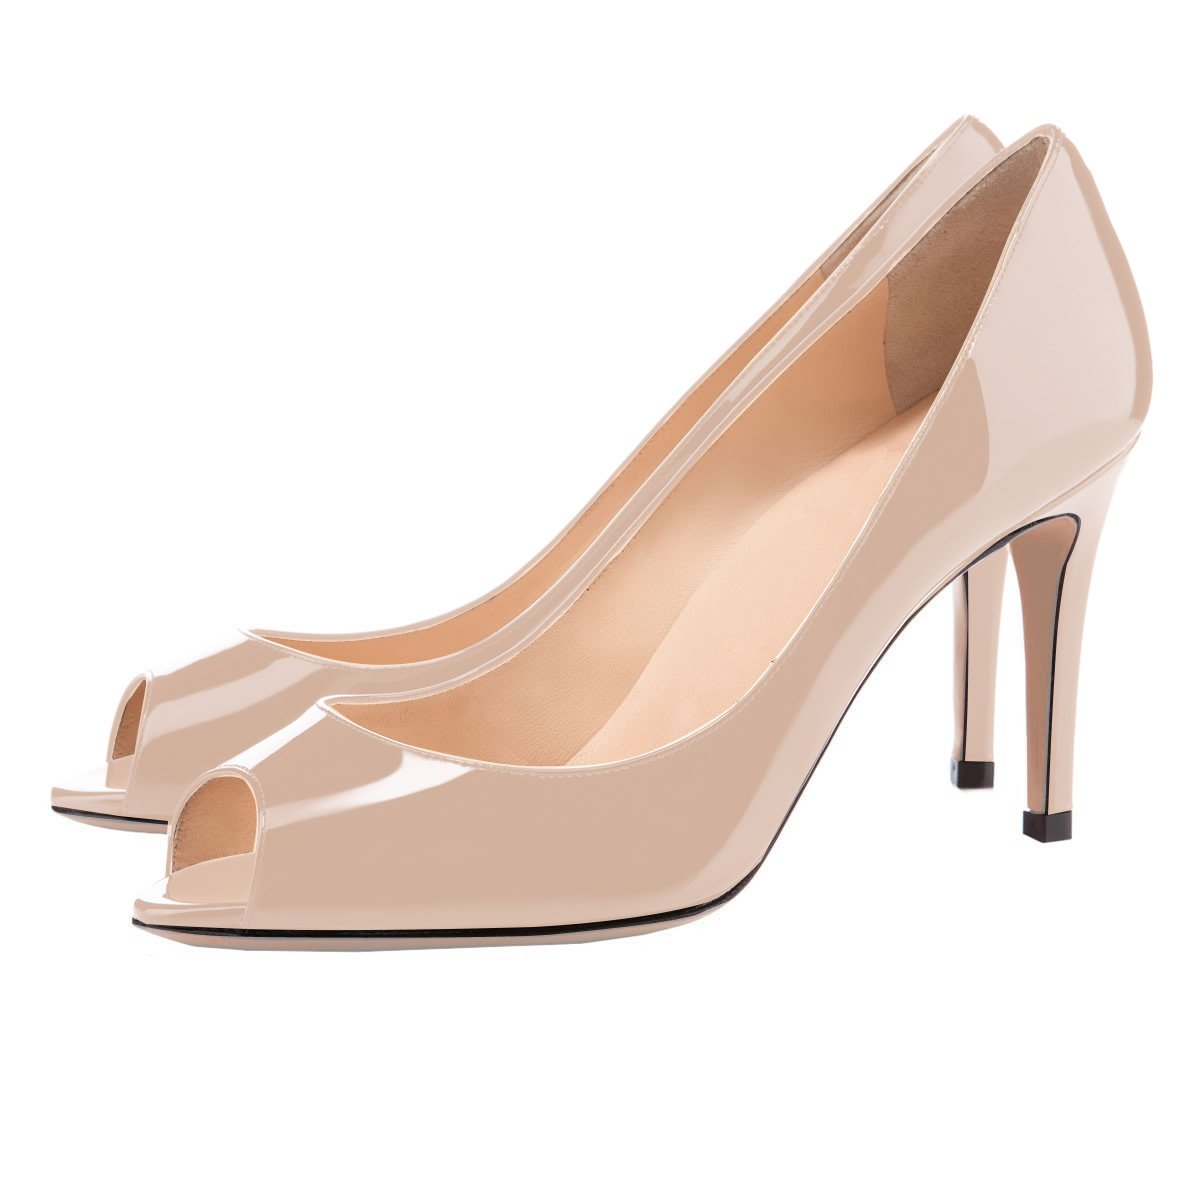 Eldof Women Peep Toe Pumps Mid-Heel Pumps Formal Wedding Bridal Classic Heel Open Toe Stiletto B07F1T9QD3 9 B(M) US|Beige